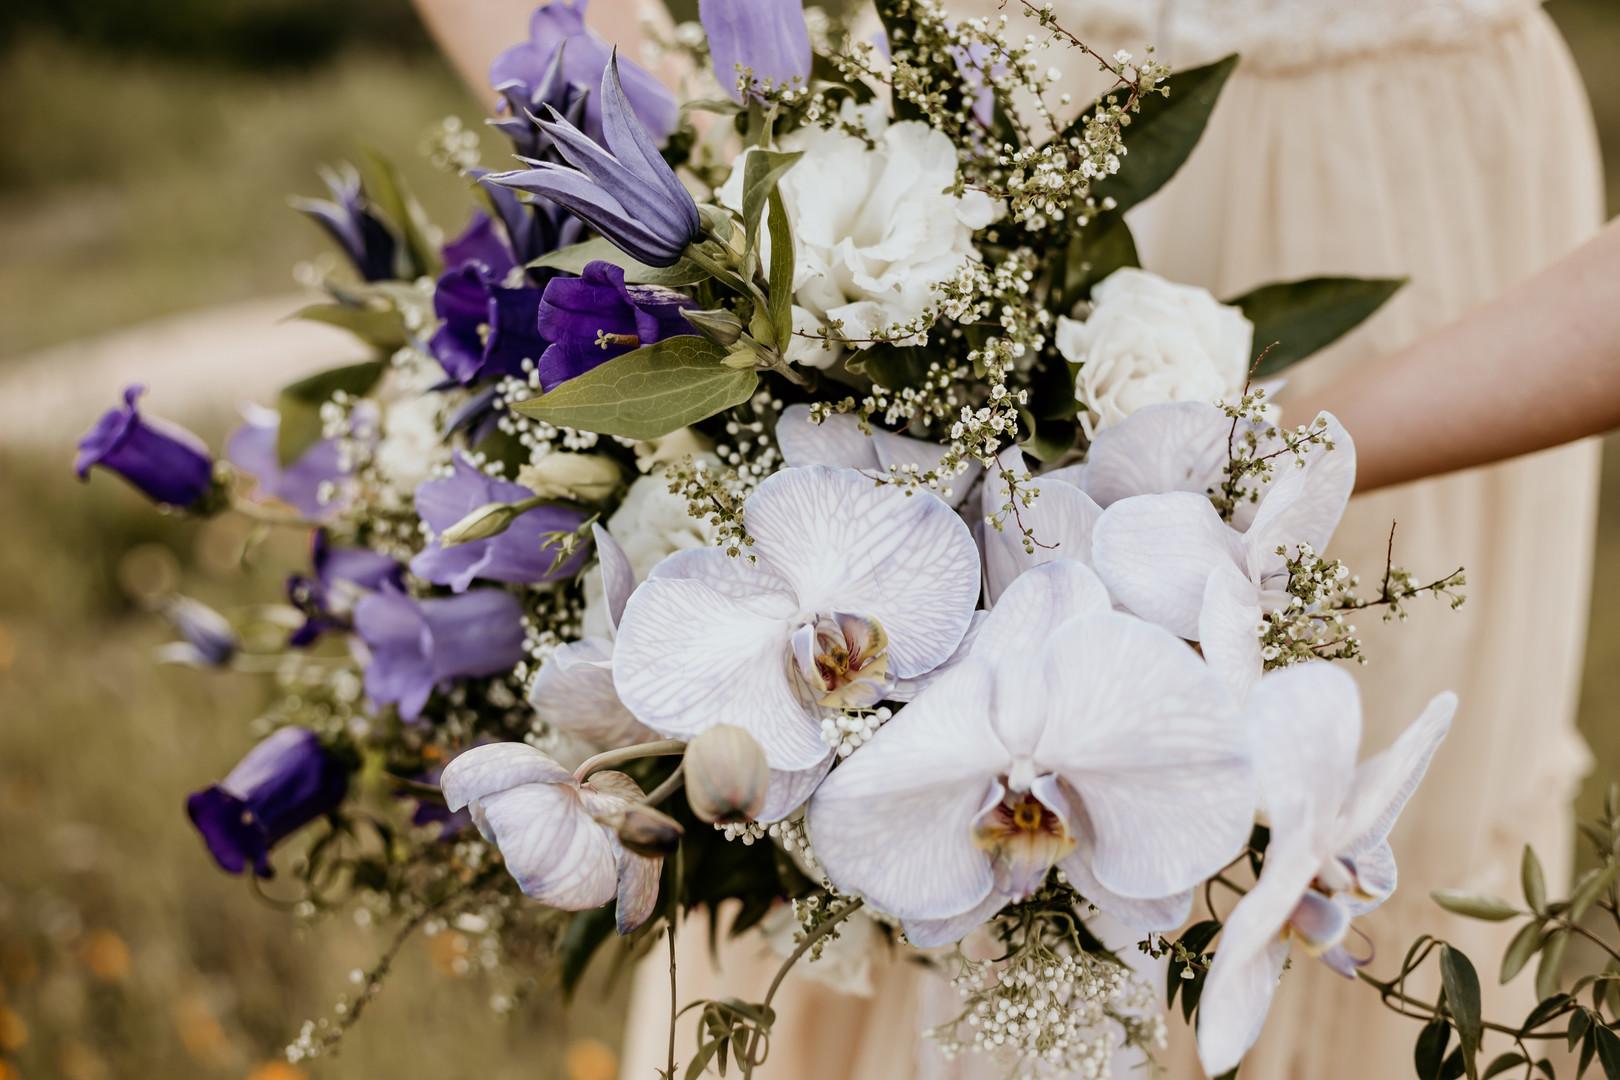 MelissaFeChapmanPhotography_PoppyfieldsbridalsessionwithBrookebyMelissaFeChapmanPhotography32819161_big.jpg